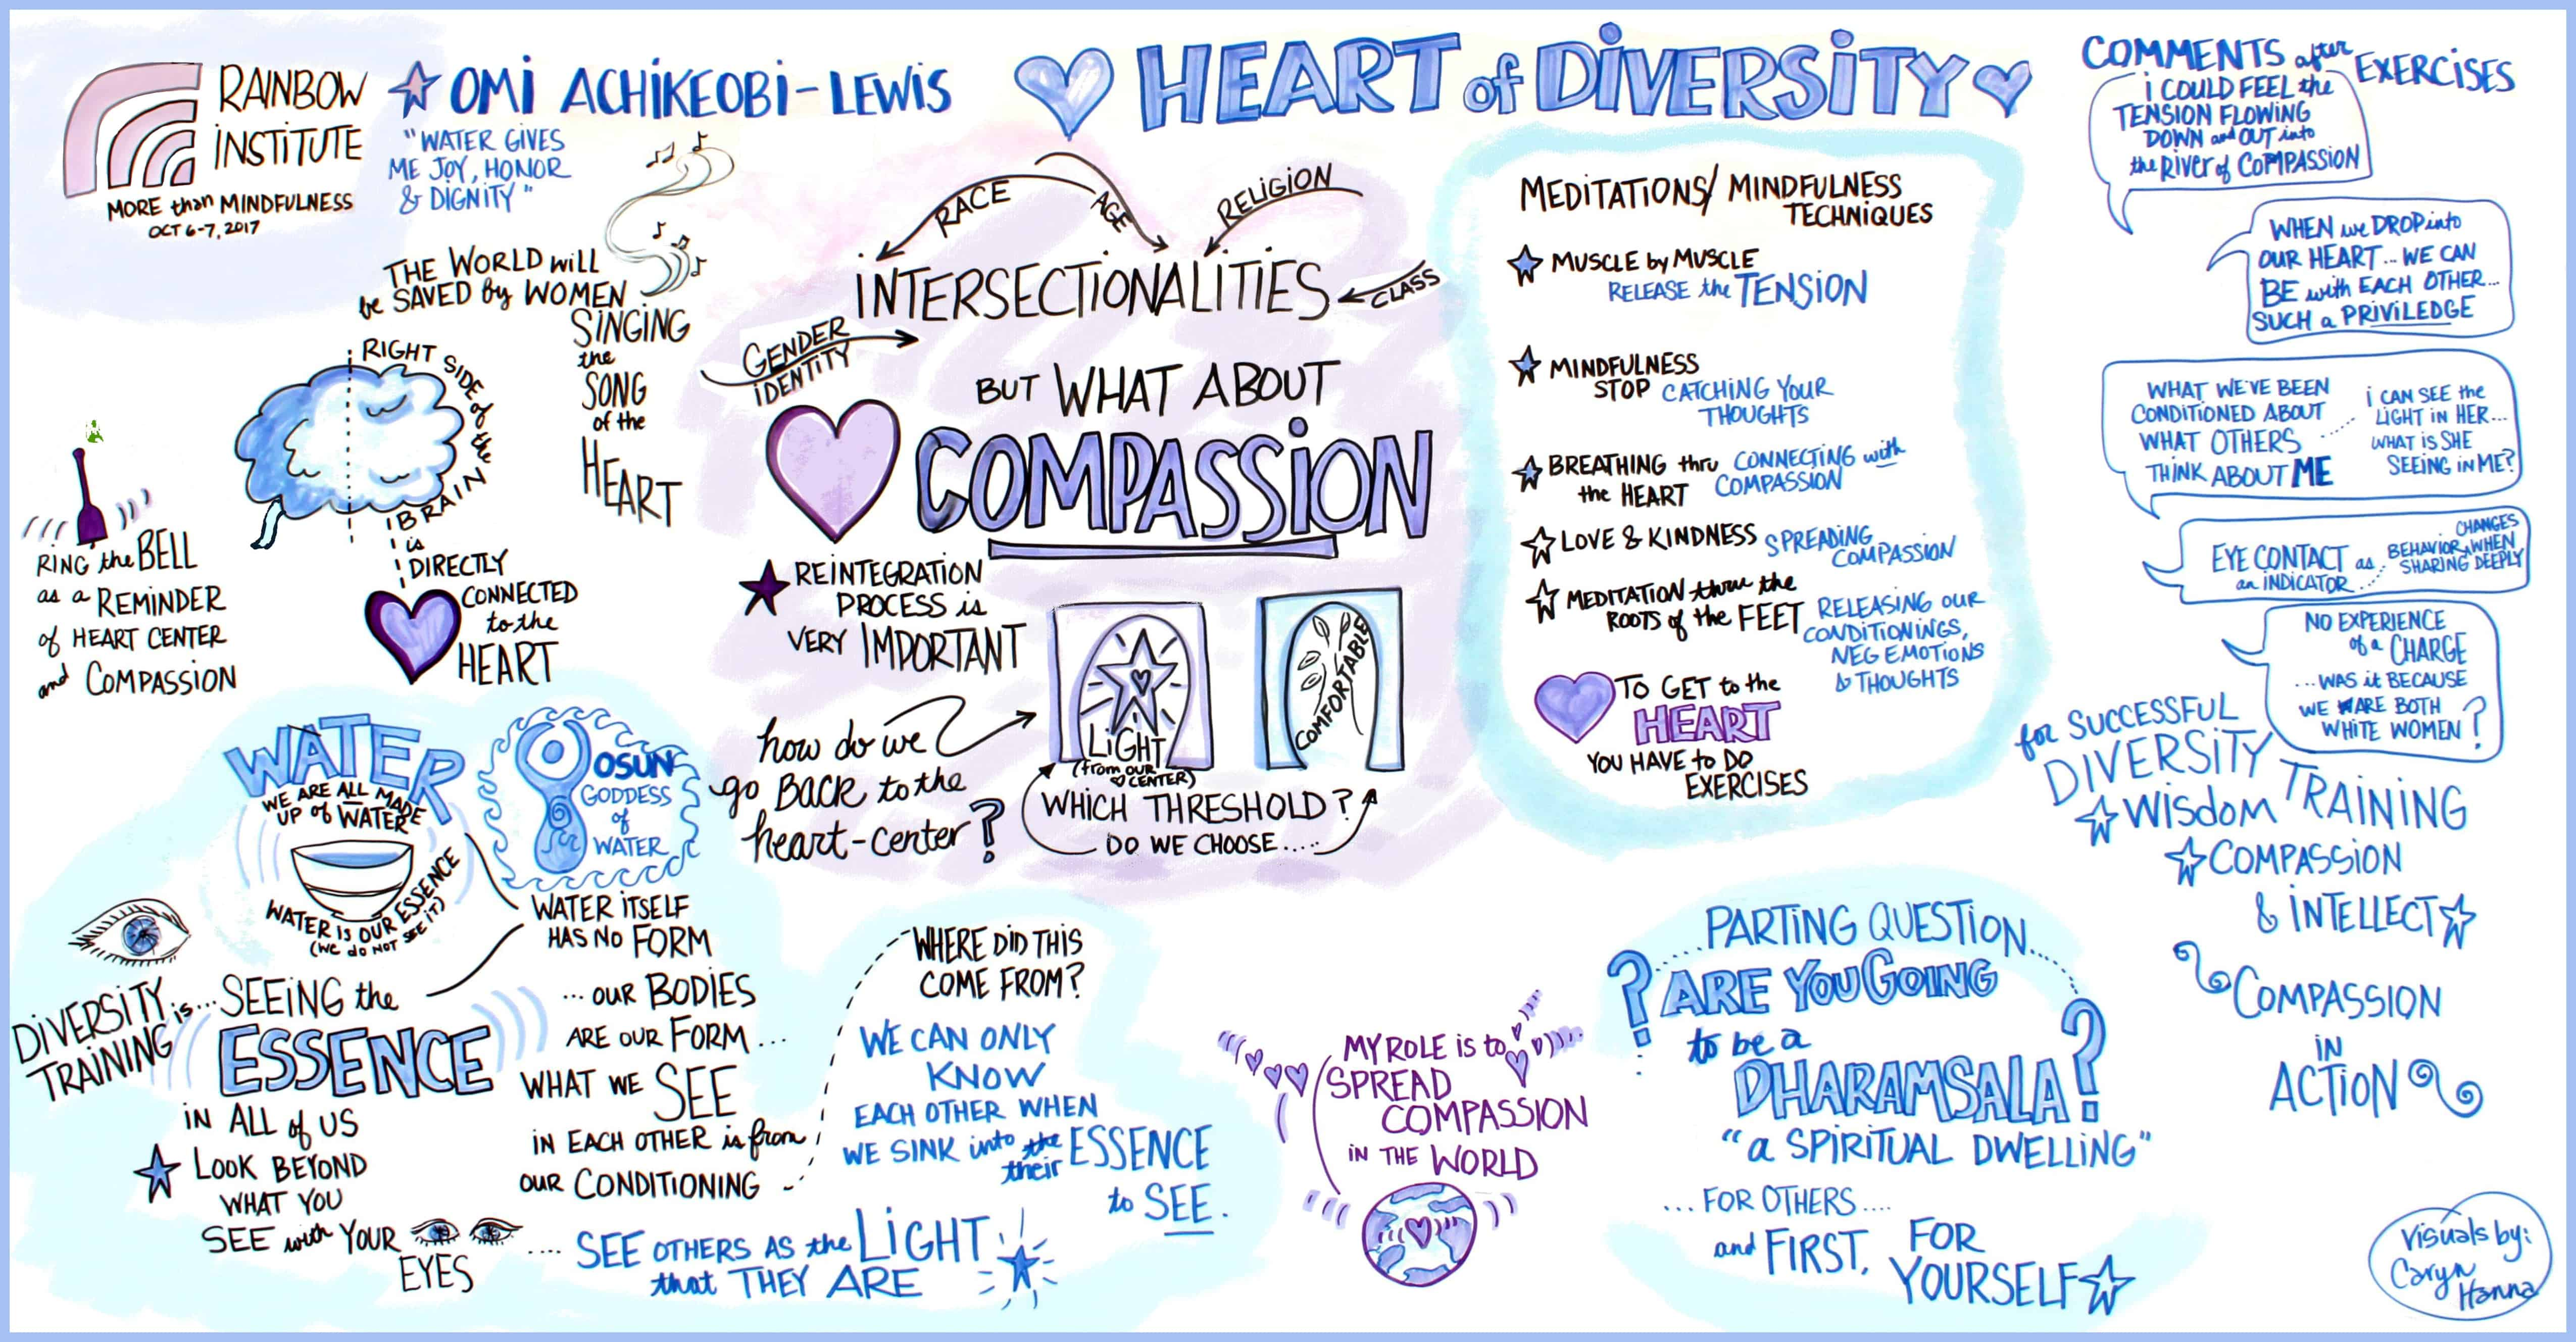 2017-10.MTM.Heart.Diversity.17